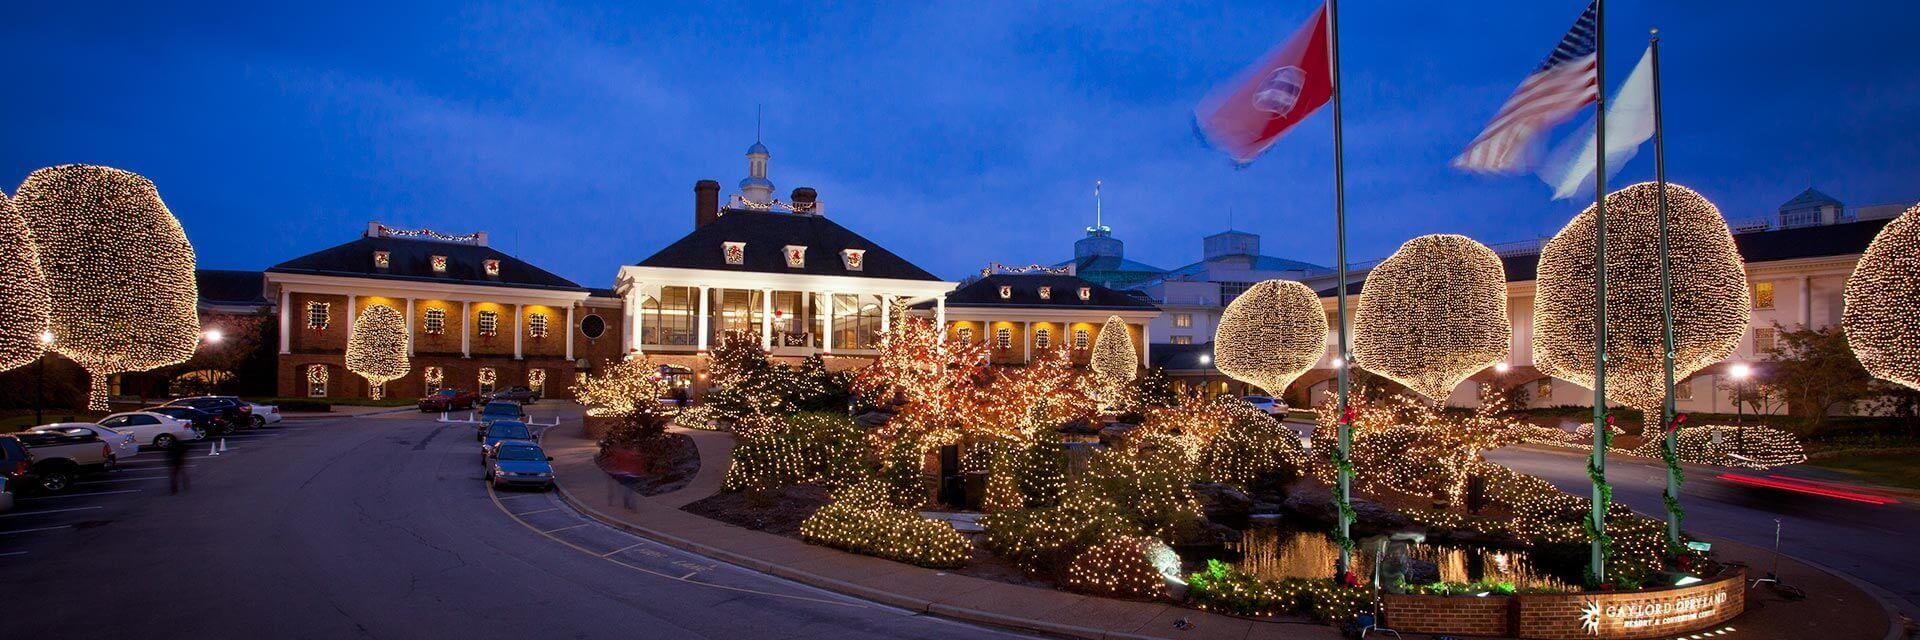 Gaylord Opryland Nashville Exterior During Christmas